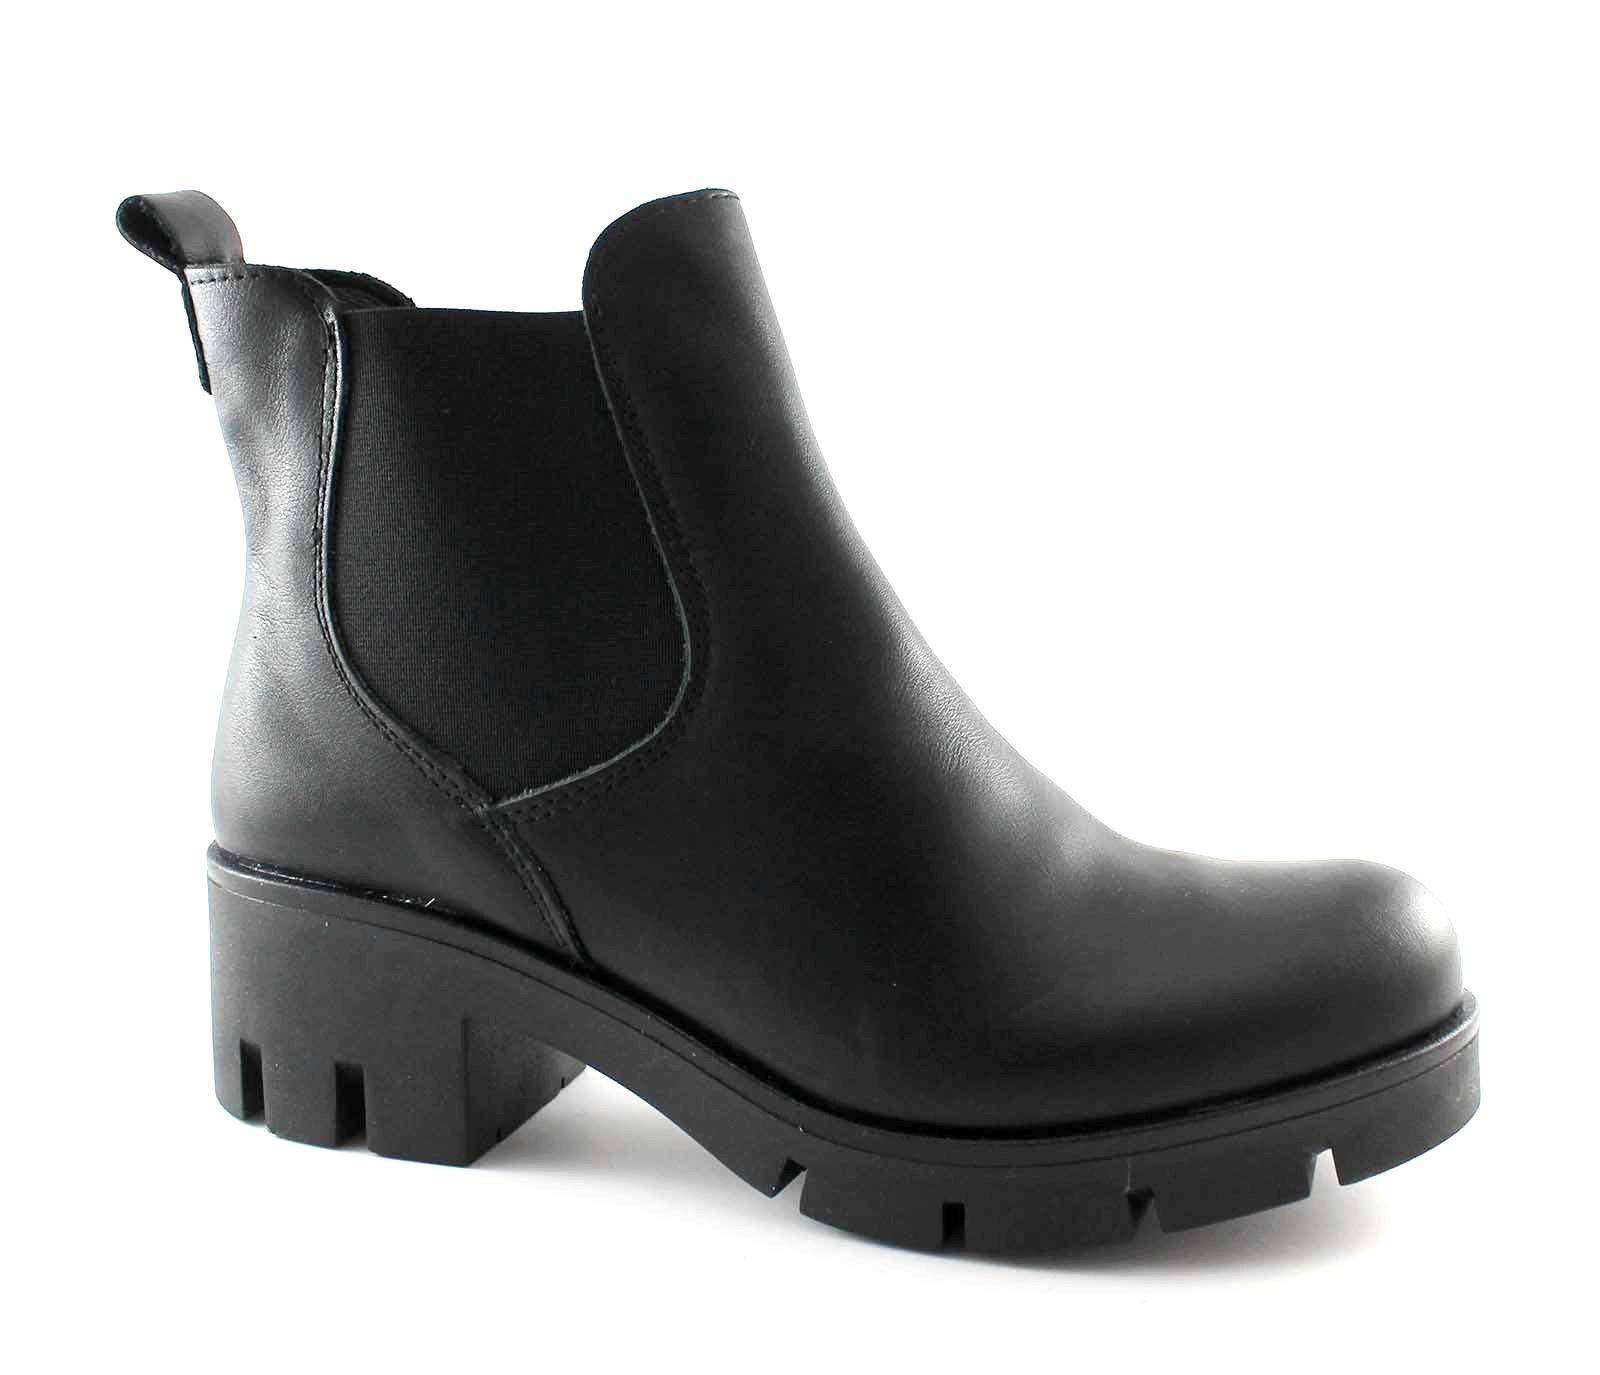 DIVINE FOLLIE stivaletto 17812U nero scarpe donna stivaletto FOLLIE beatles suola micro 336083